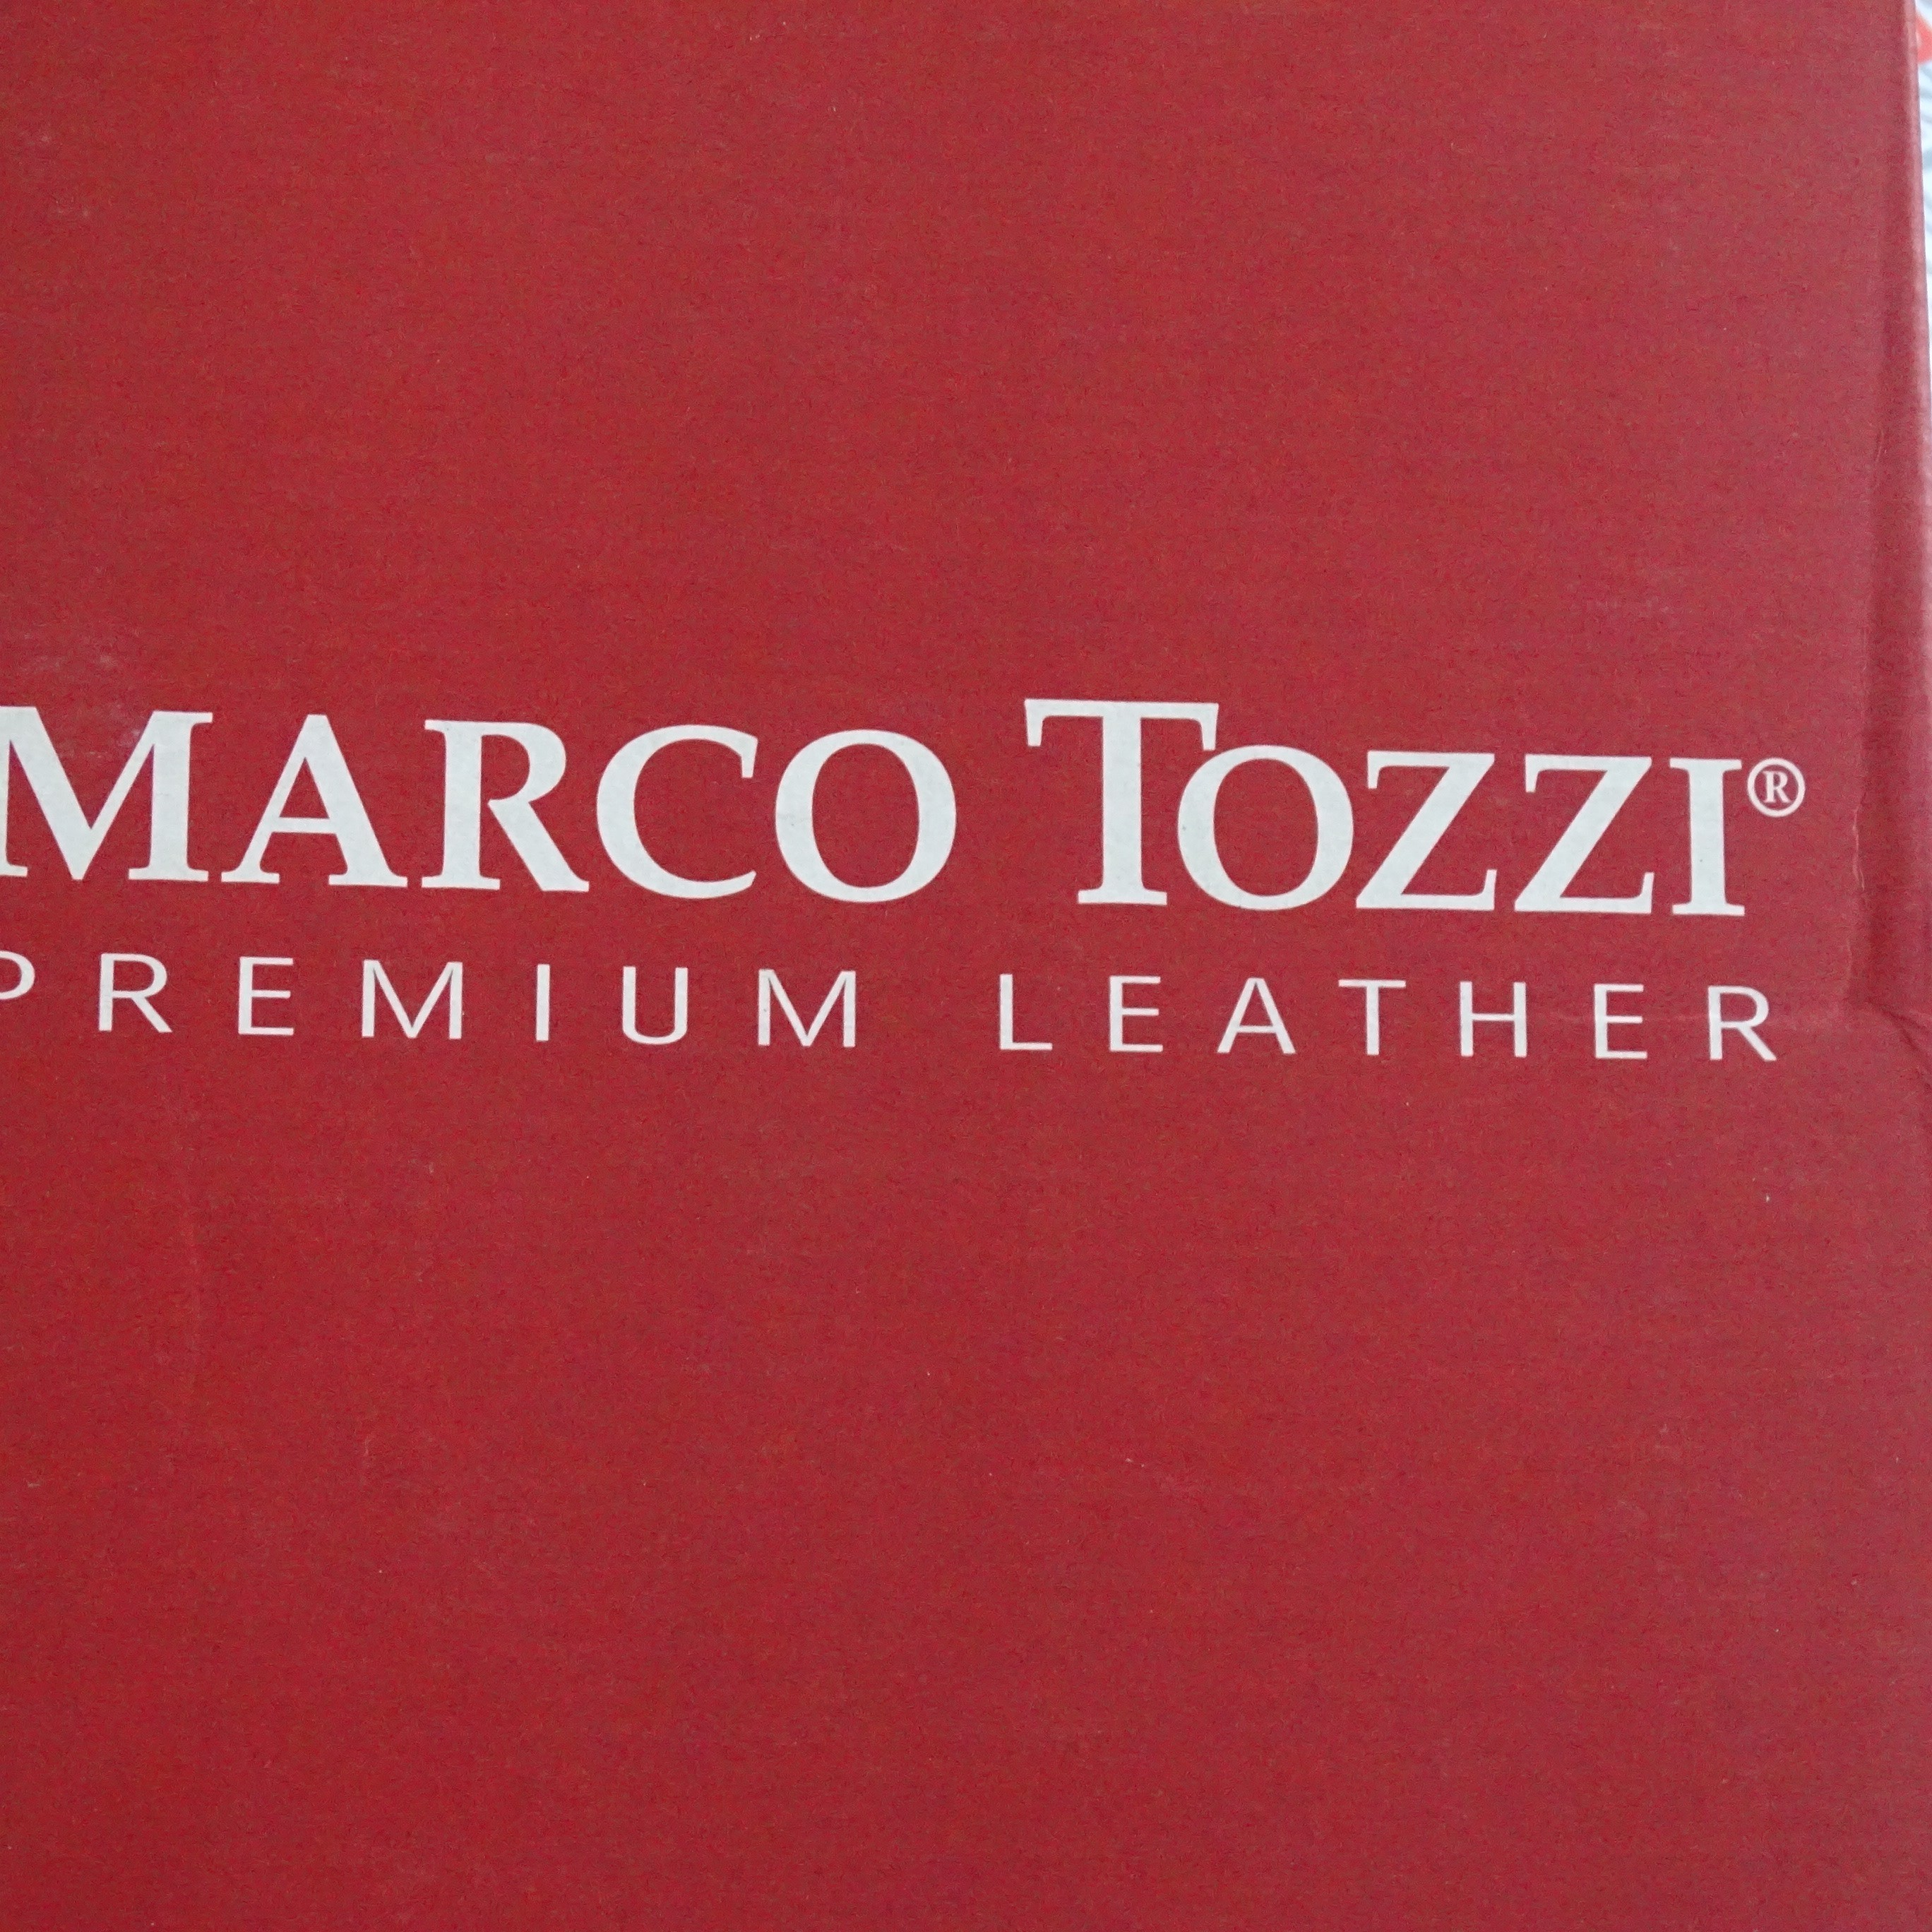 Branded Shoes, Marco Tozzi, Buffalo London, Bordello & More, 30 Pairs, Est. Original Retail €7,470, Budapest, HU, FREE SHIPPING